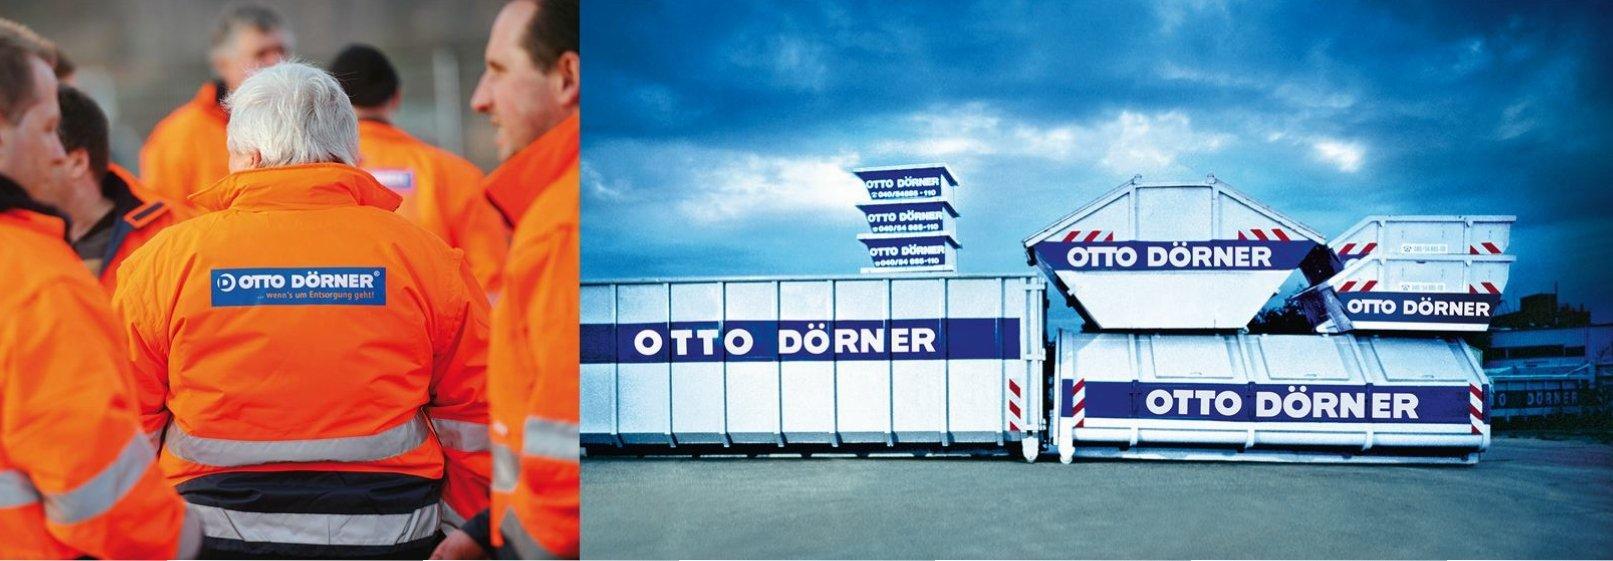 OTTO DÖRNER Entsorgung GmbH Kiel  in 24145 Kiel